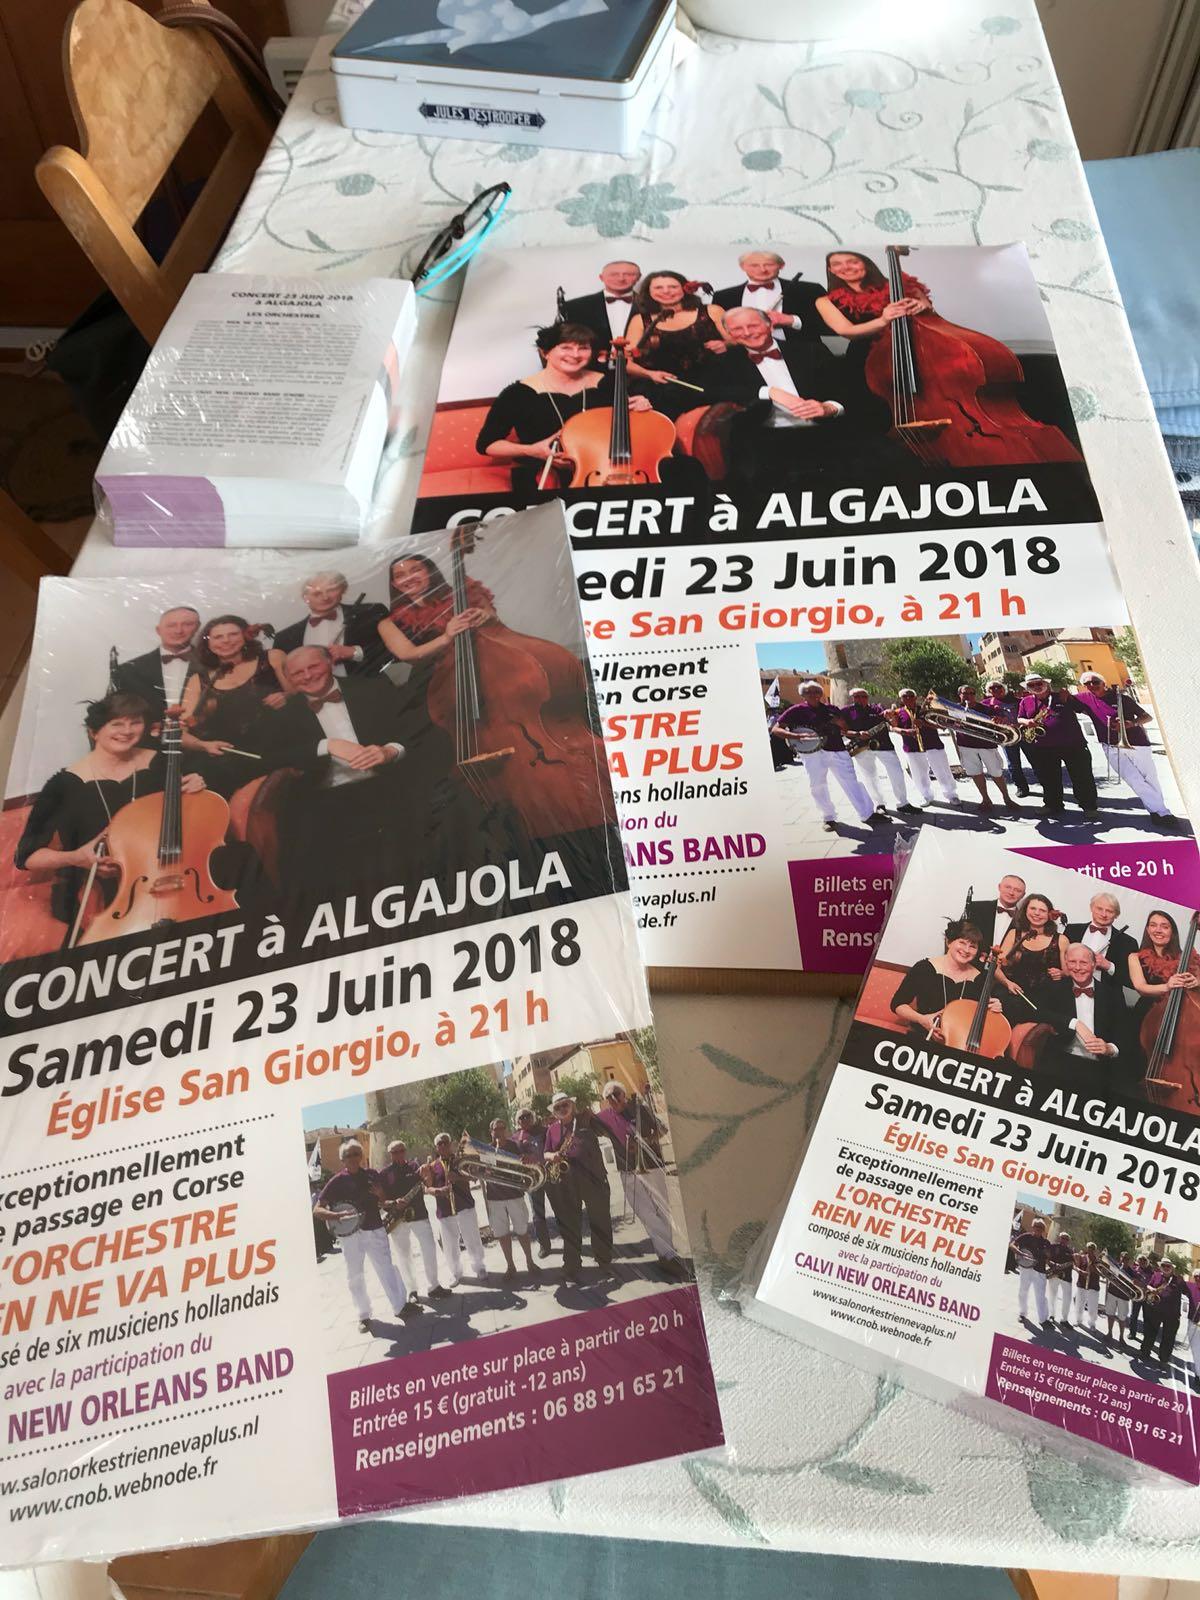 Corsica, jubileumconcert, 2018